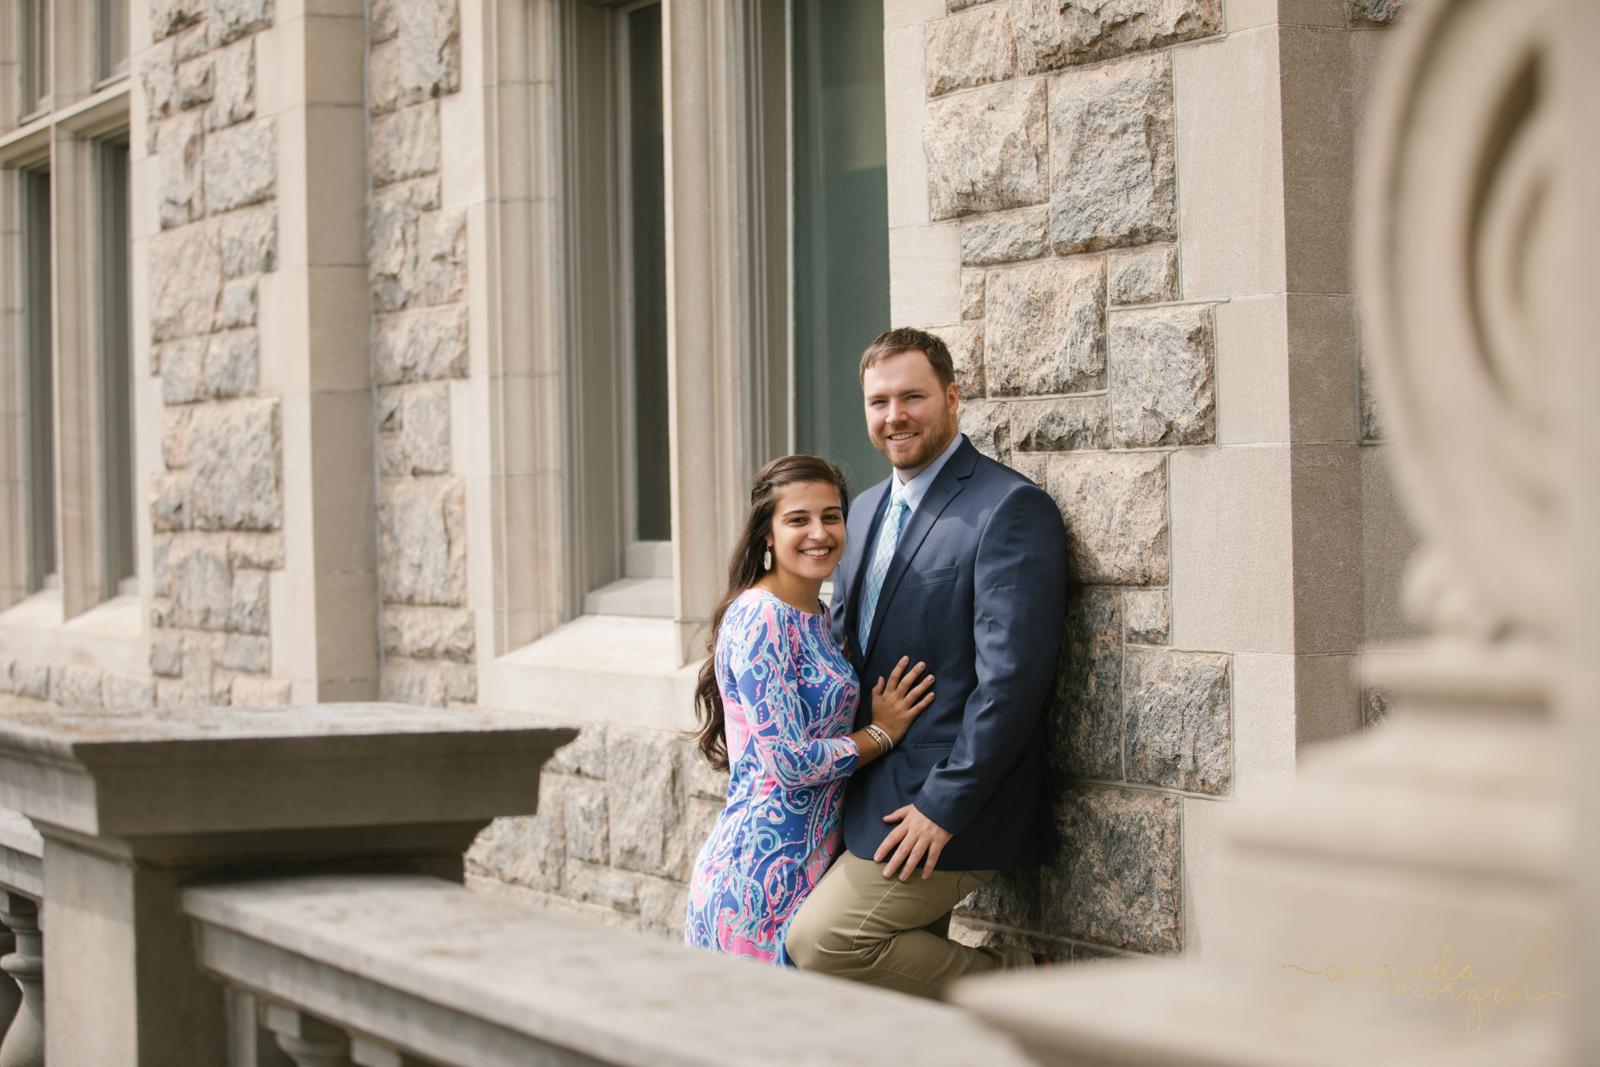 Surprise-Engagement-photos-amanda-morgan-25.jpg